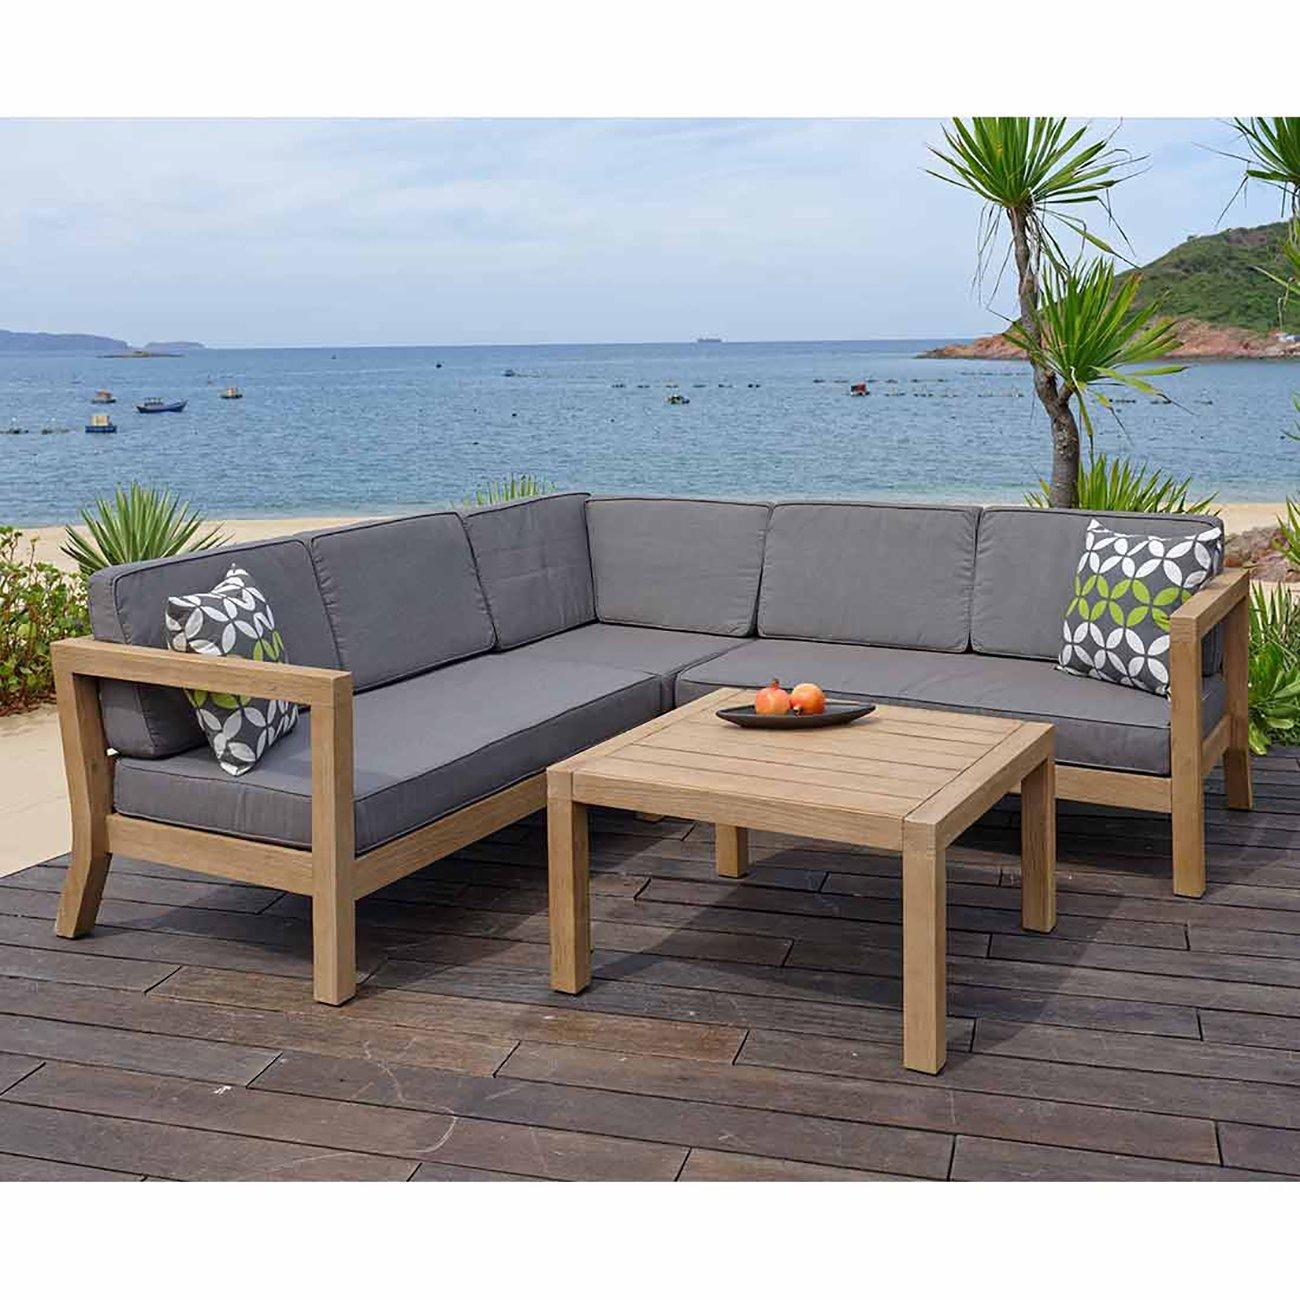 outliv vlieland loungeecke 4tlg akazie teak look polster ecru loungem bel online bestellen. Black Bedroom Furniture Sets. Home Design Ideas